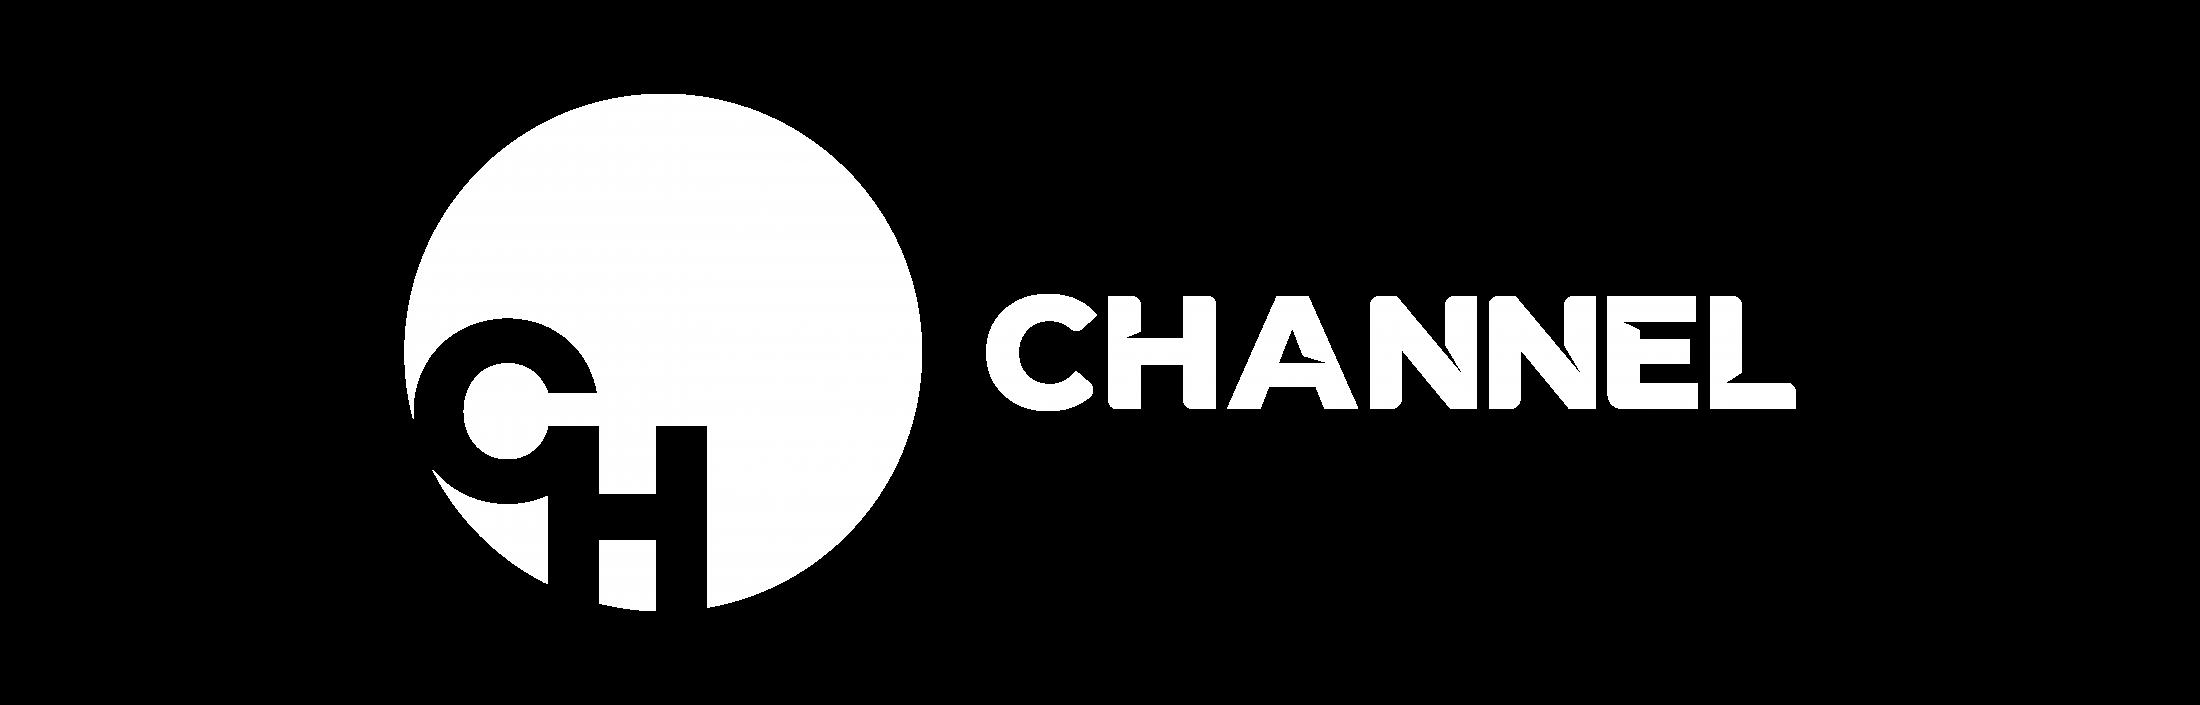 Cintai Hidup Logo